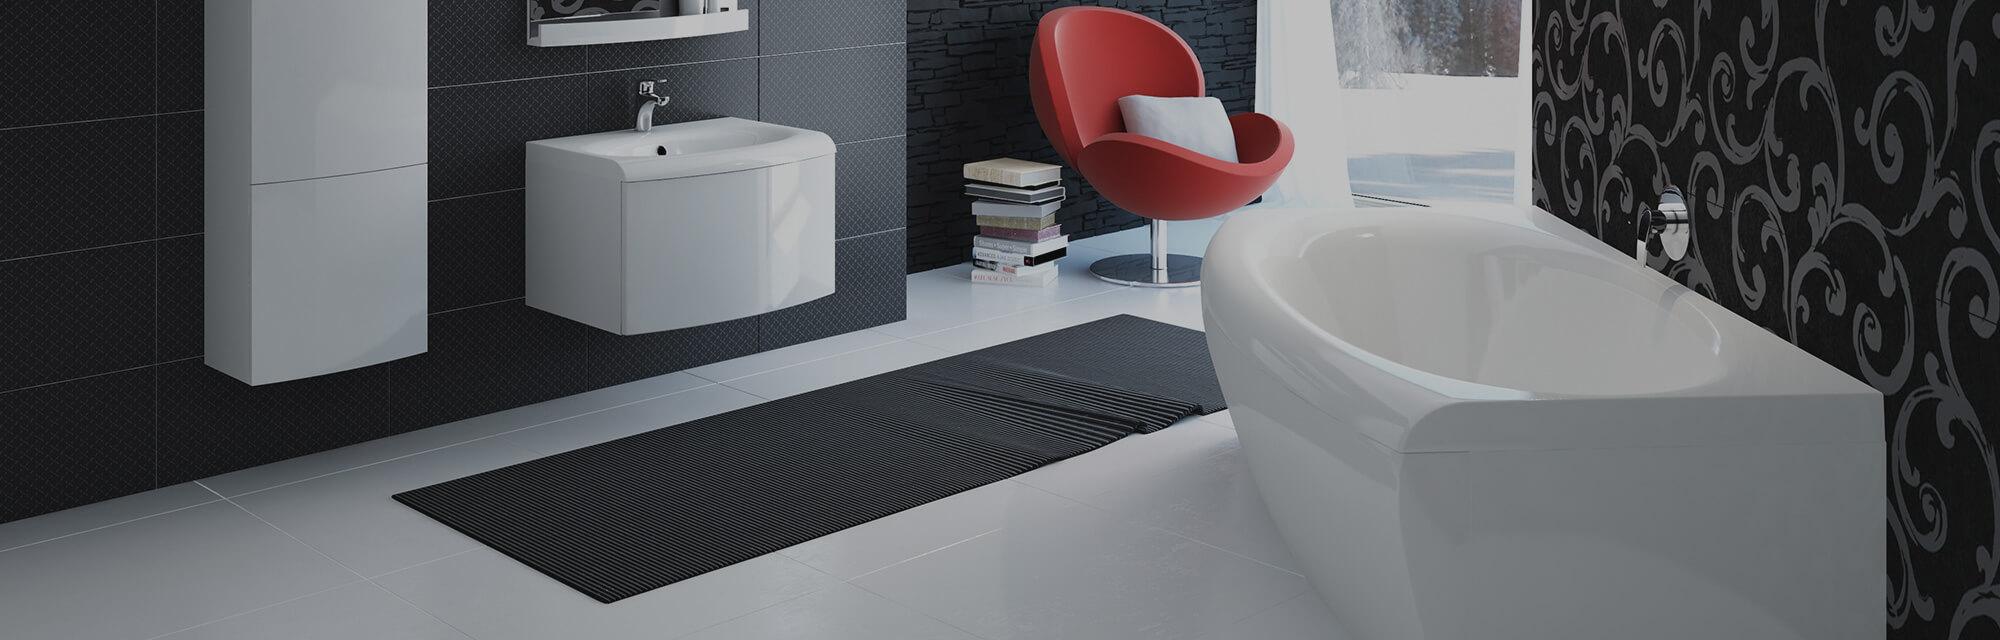 Ravak a.s.   ma salle de bains